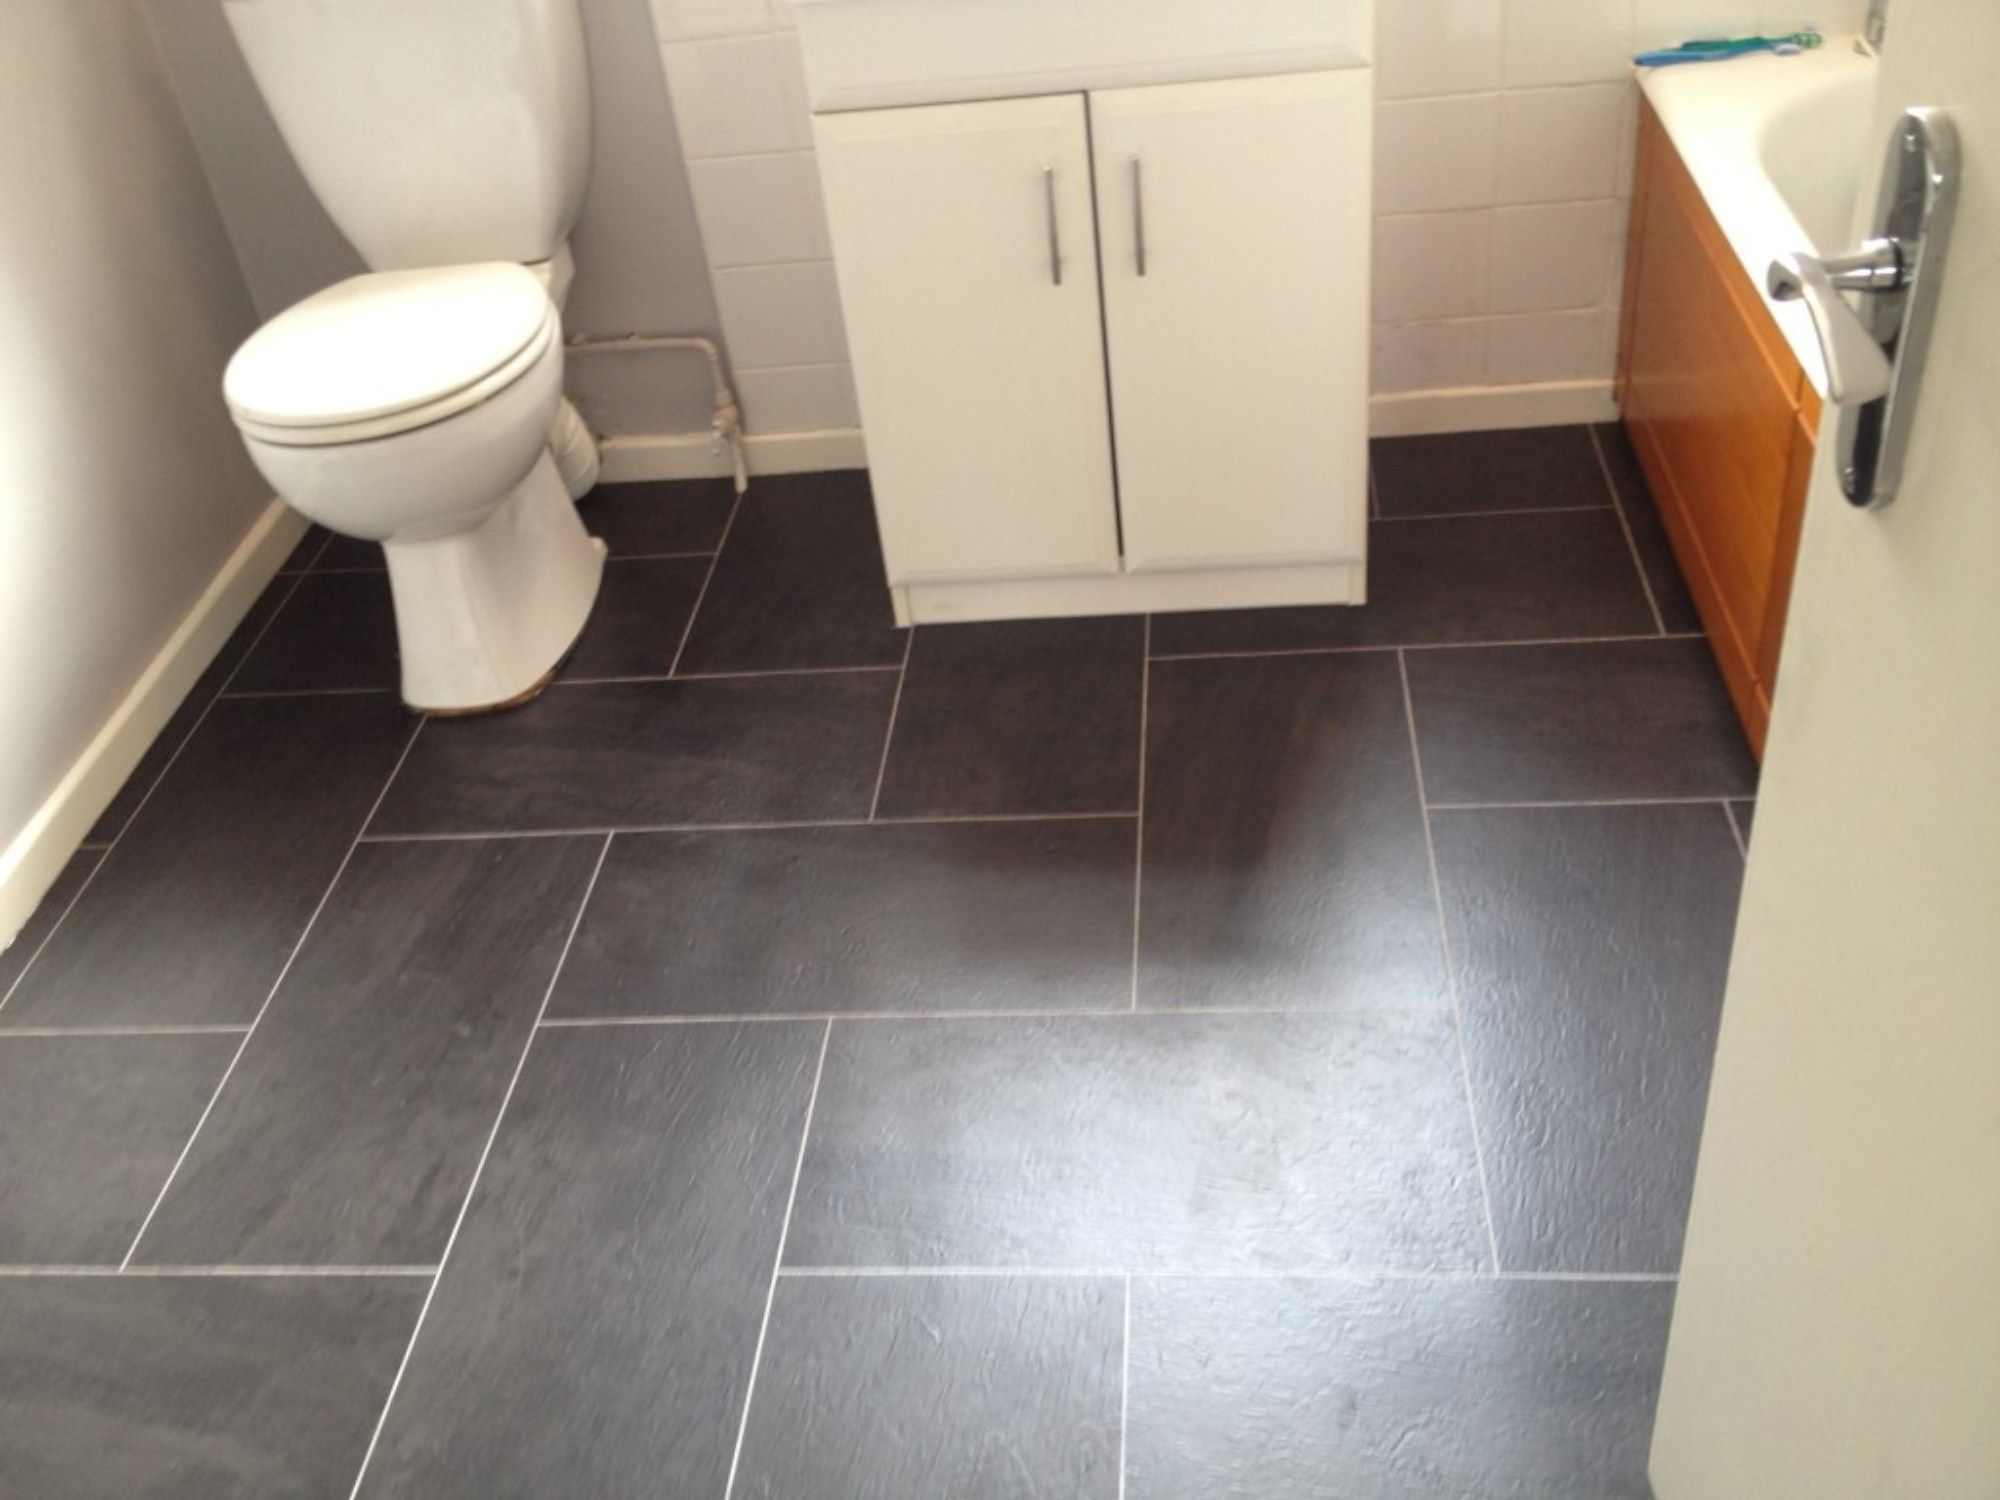 White quartz bathroom floor tiles bathroom exclusiv pinterest white quartz bathroom floor tiles dailygadgetfo Image collections